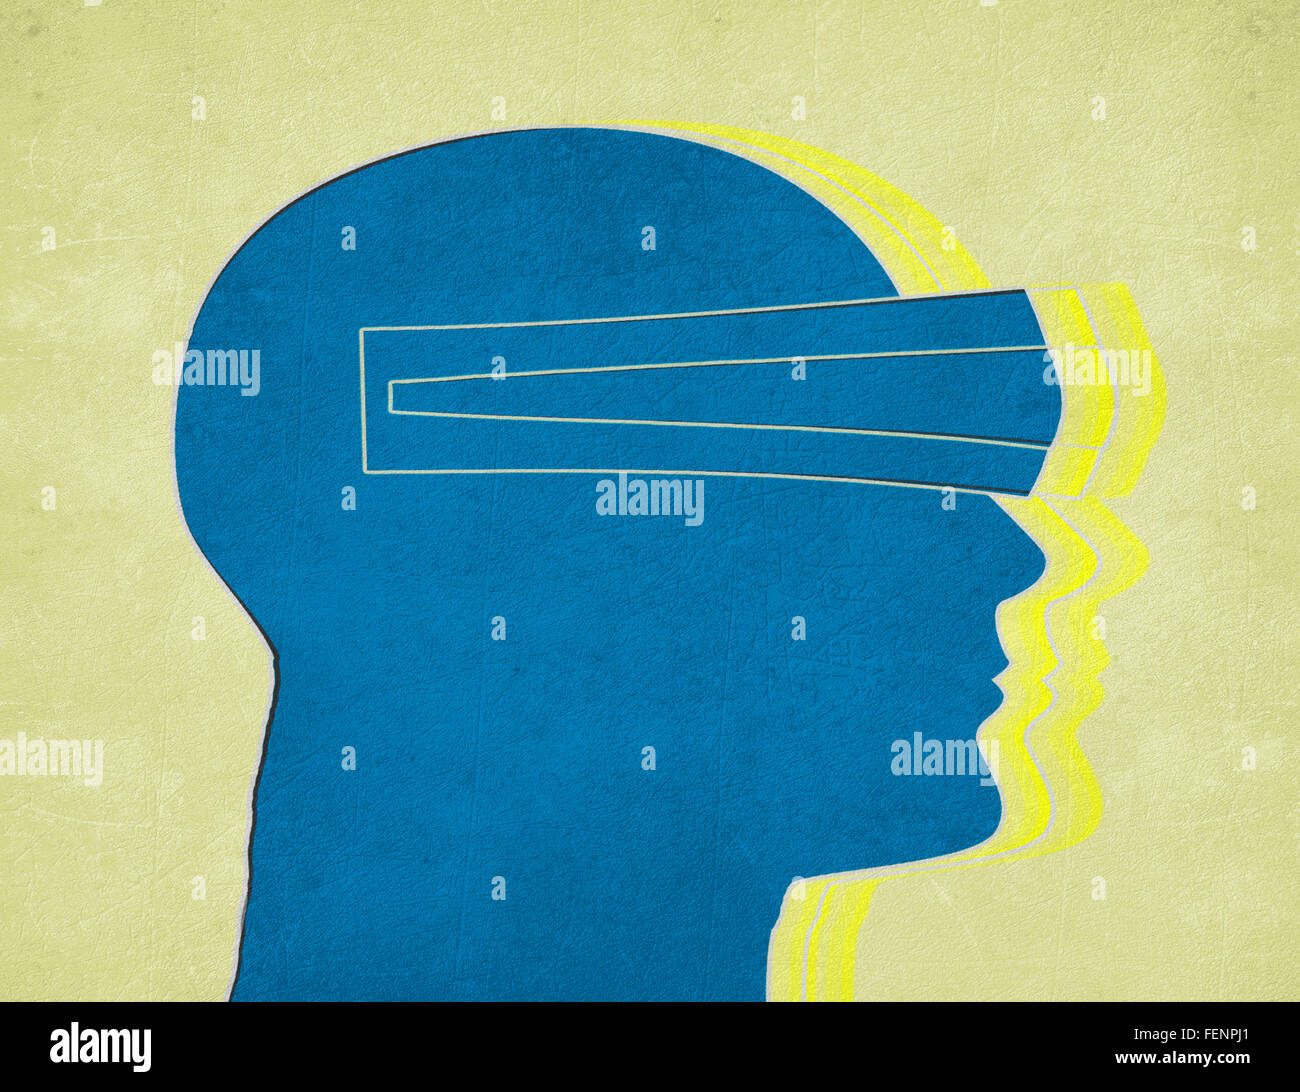 Virtual-Reality-Konzept digitale illustration Stockfoto